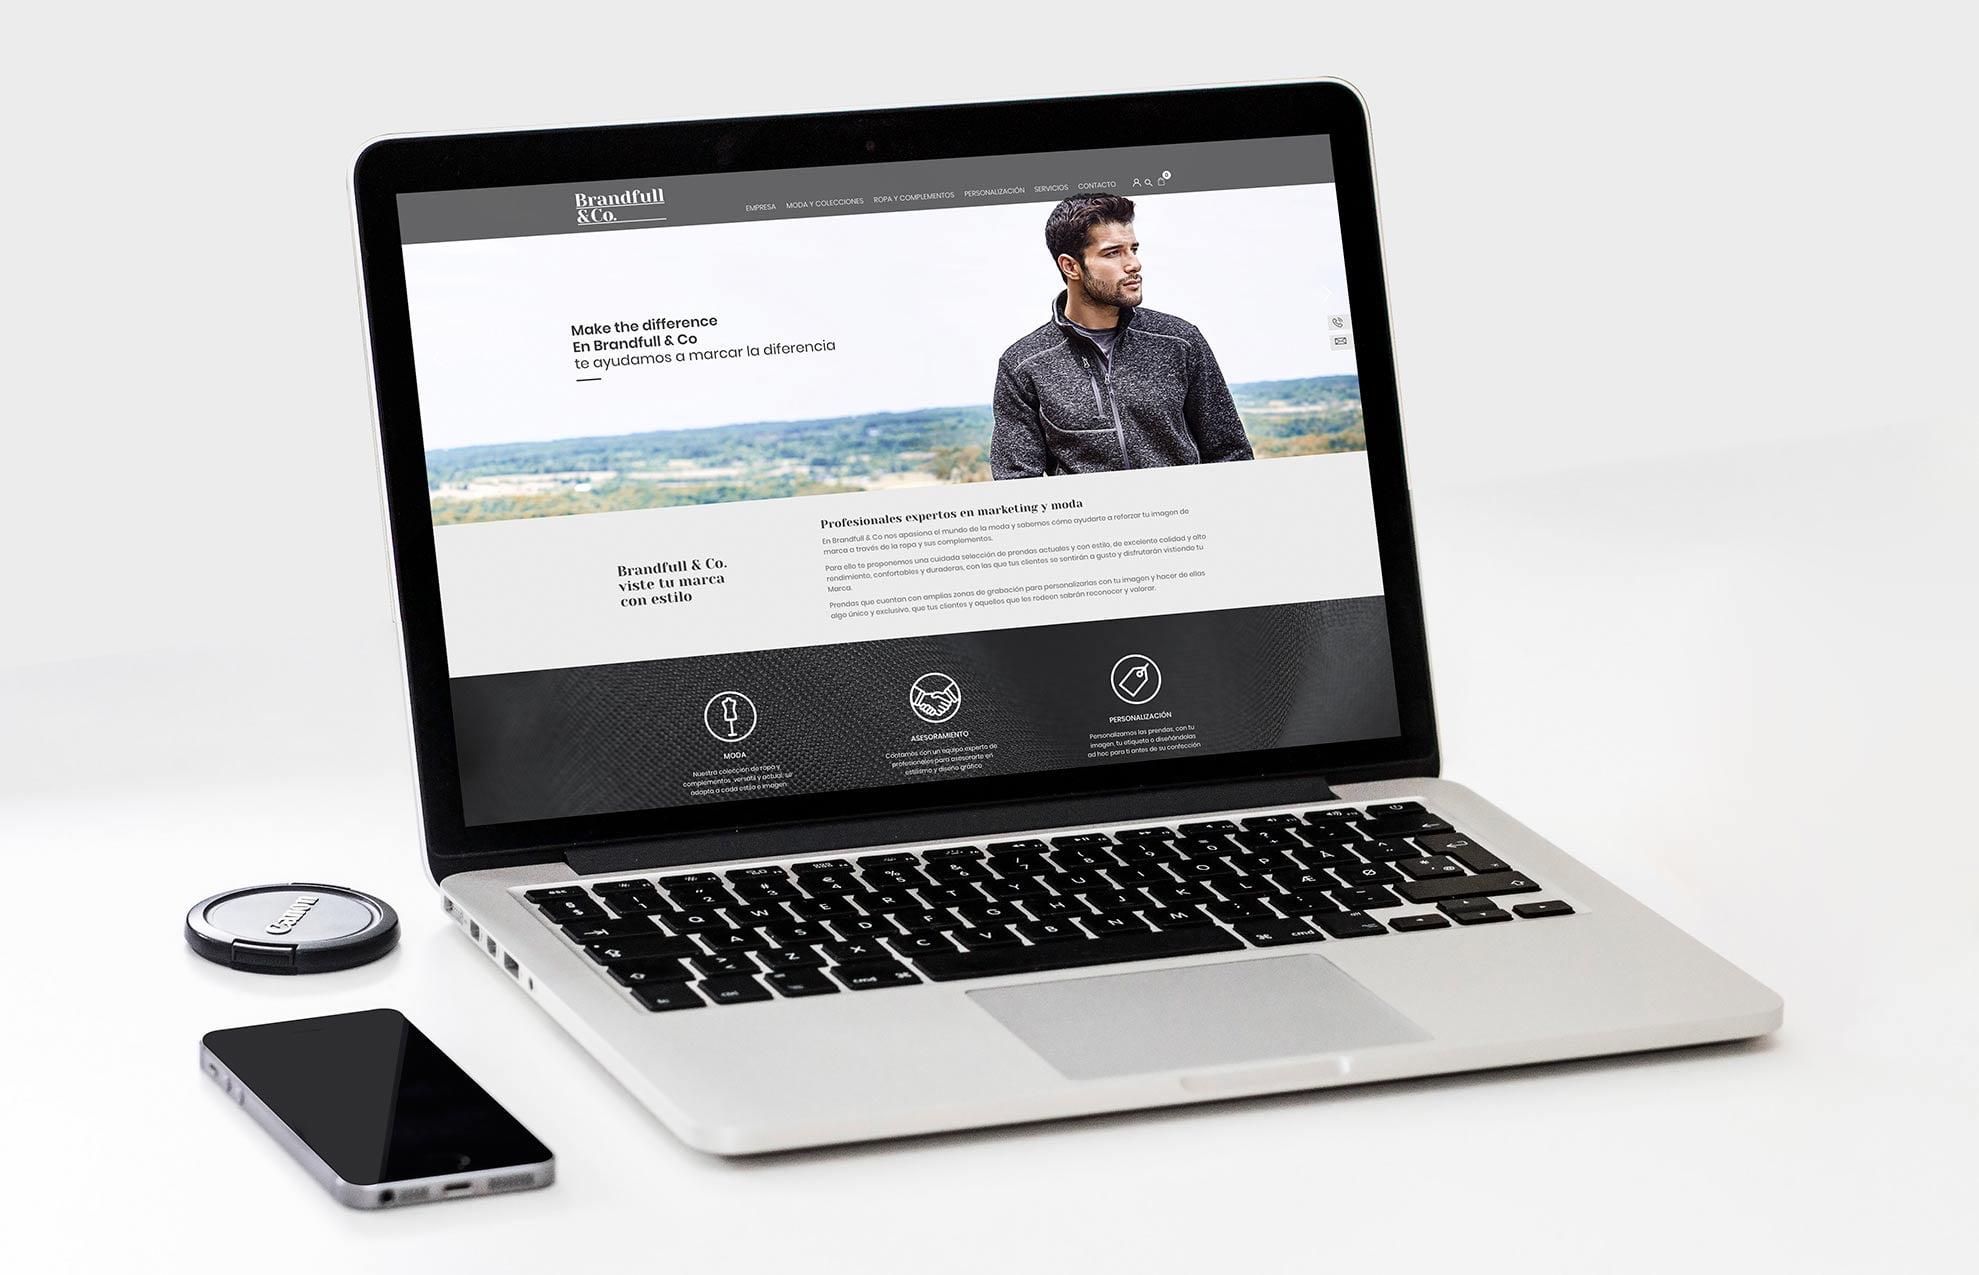 diseno ecommerce moda - Brandfull&Co, un proyecto integral de diseño